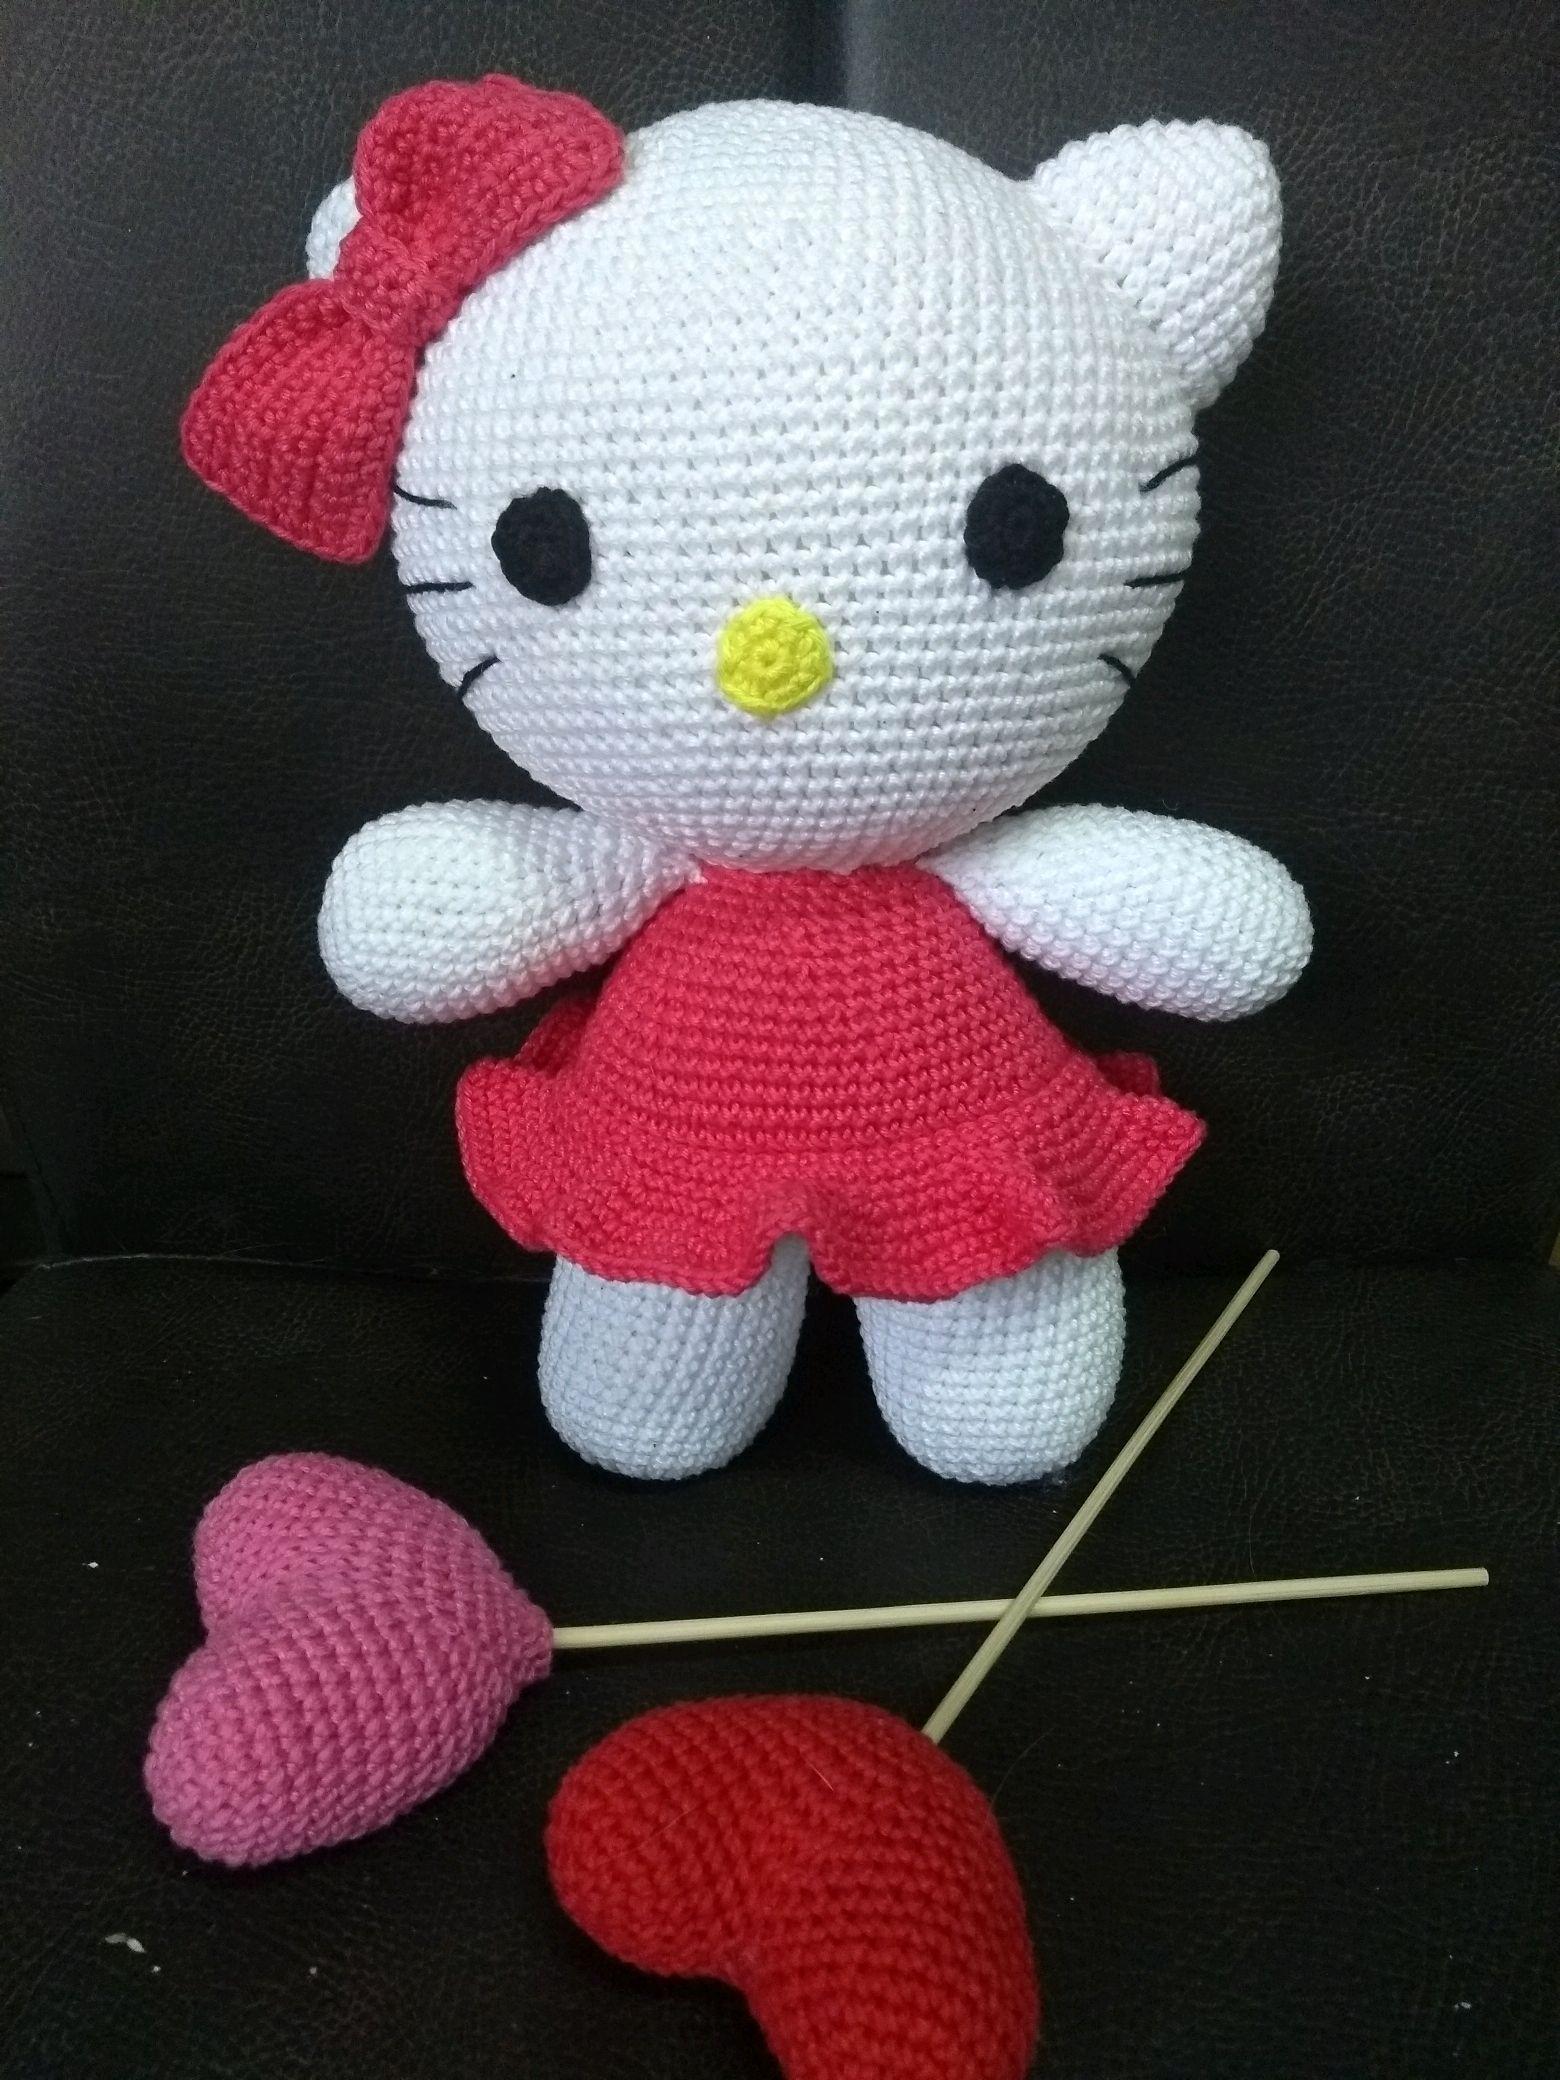 Boneca Hello Kitty Em Crochê – Material e Vídeo | Bigtudo Artesanato | 2080x1560